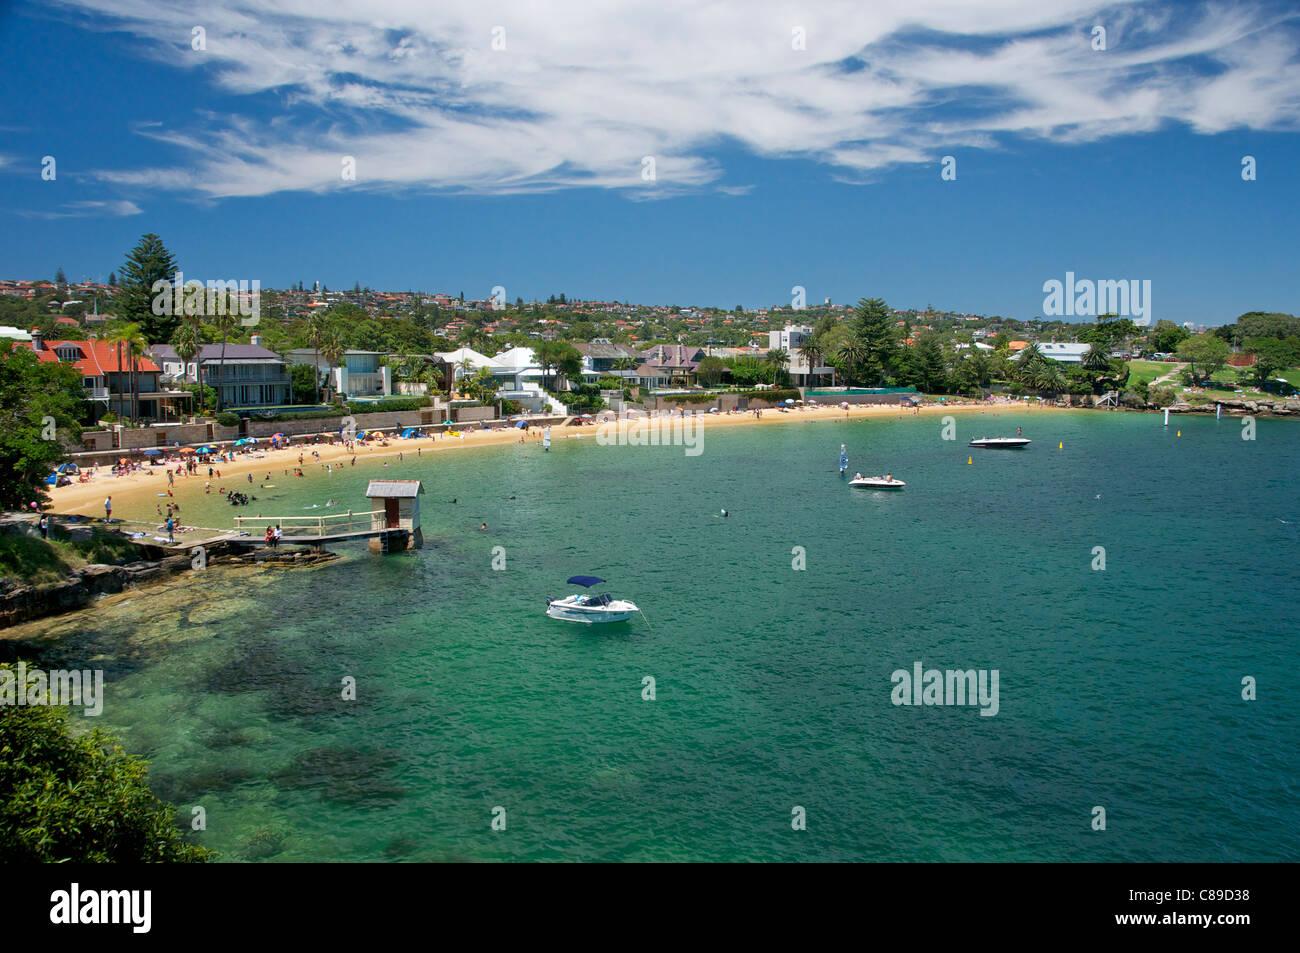 Camp Cove Sydney Harbour Australia - Stock Image